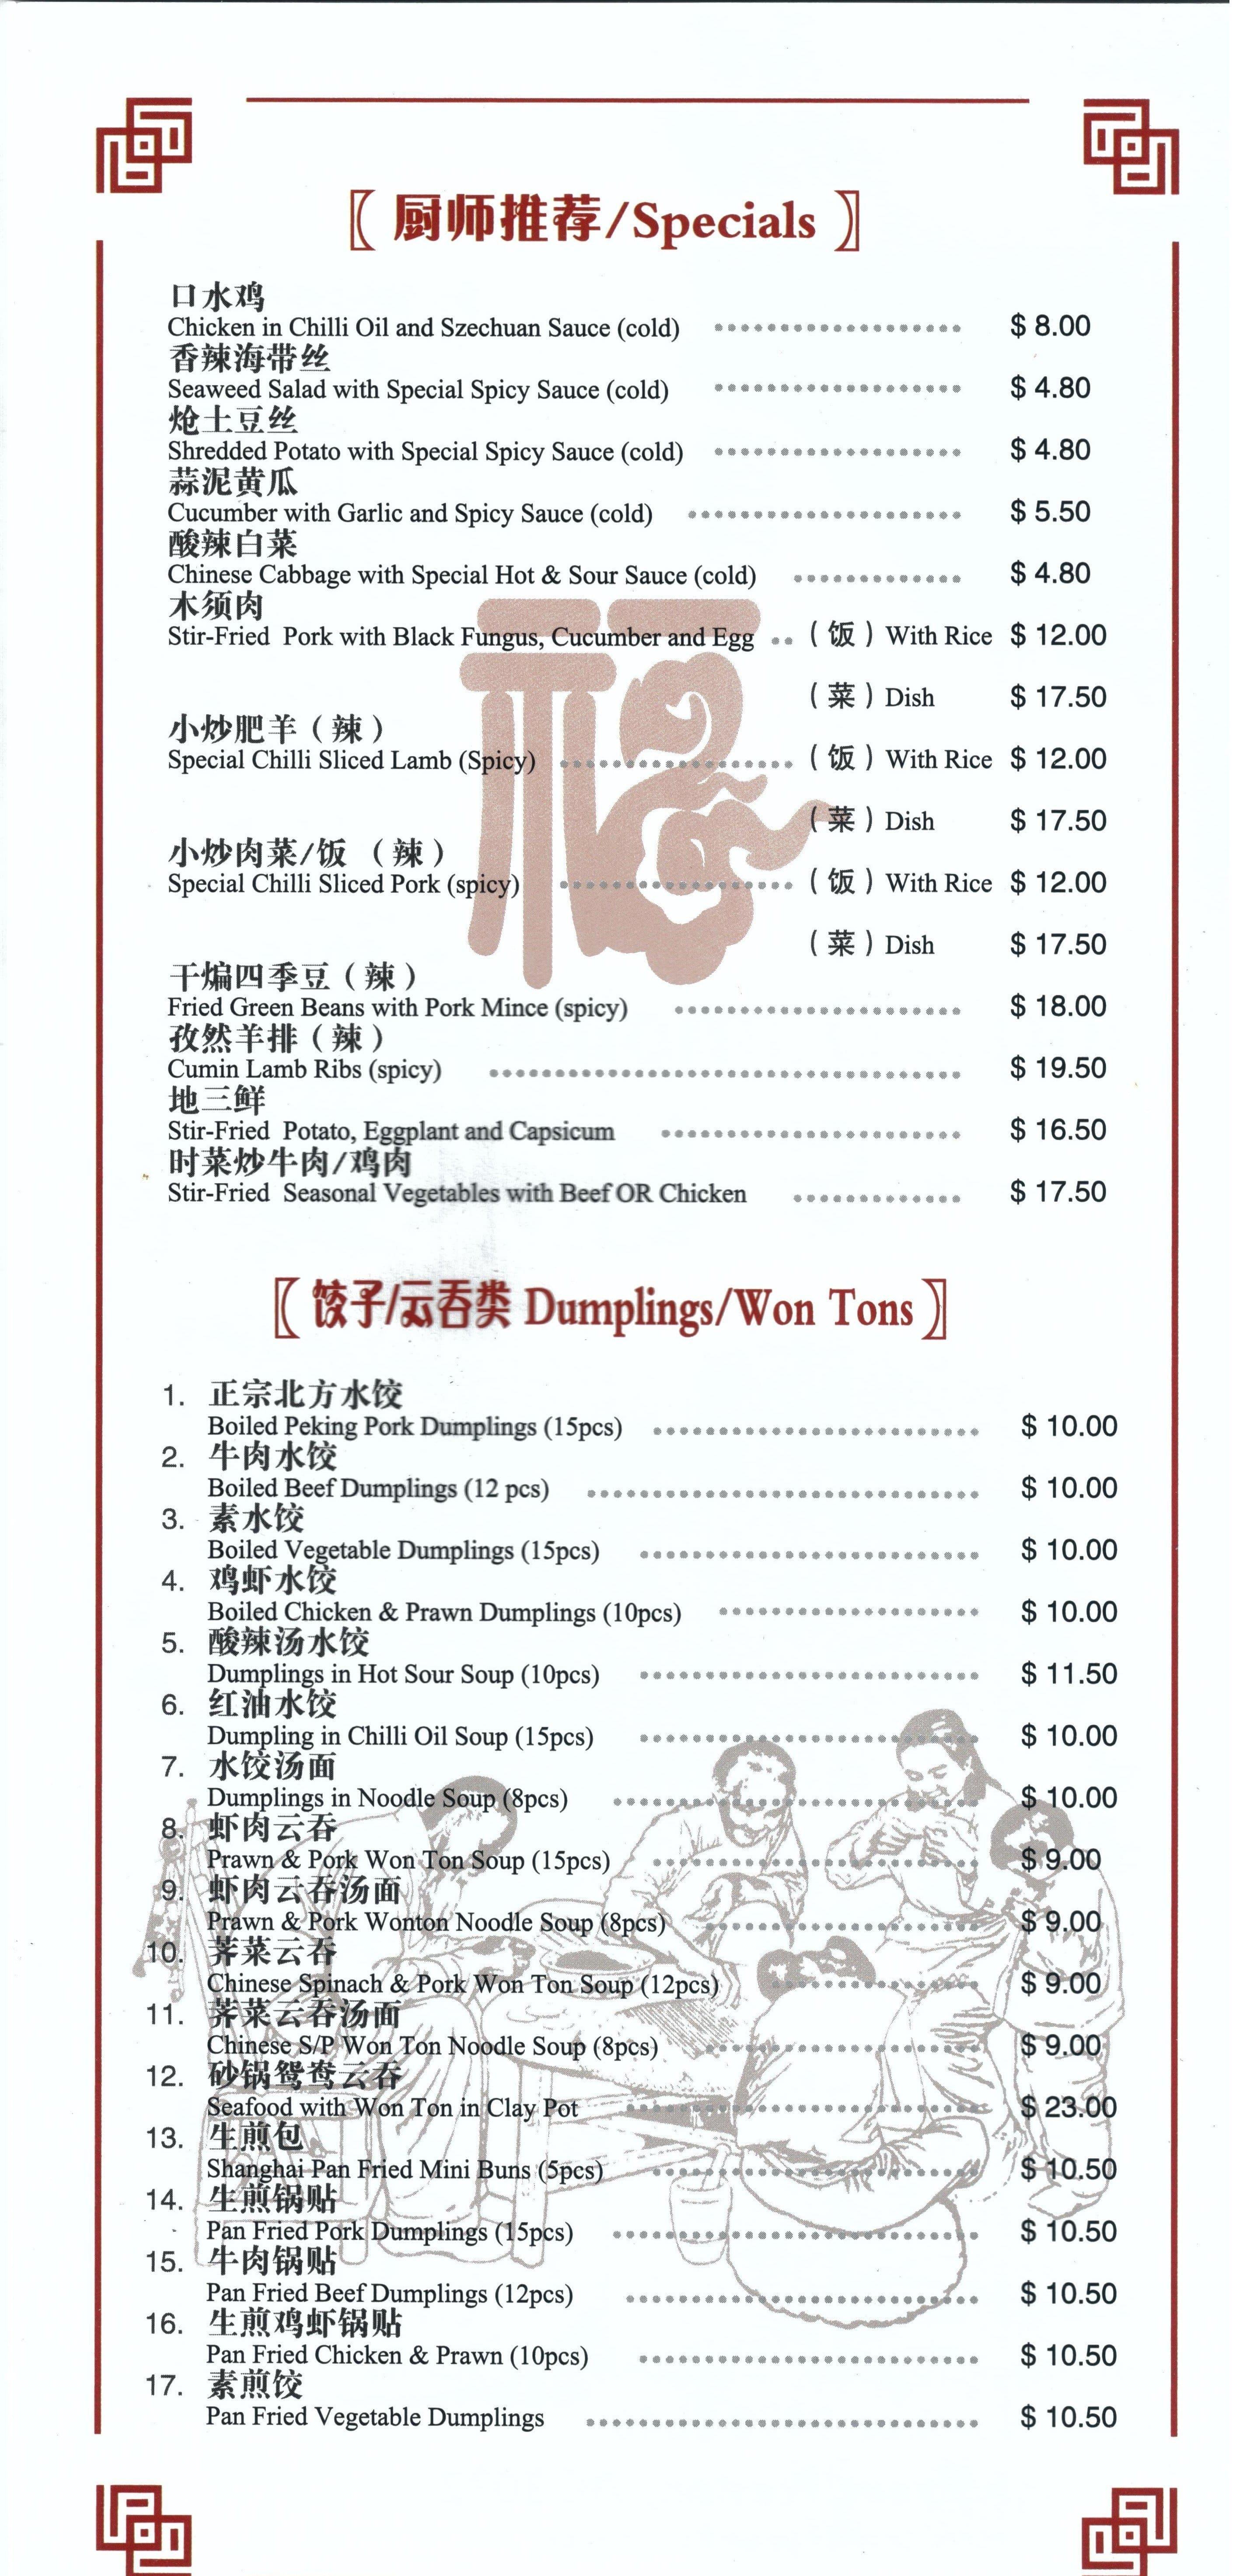 Ping\'s Dumpling Kitchen Menu - Urbanspoon/Zomato